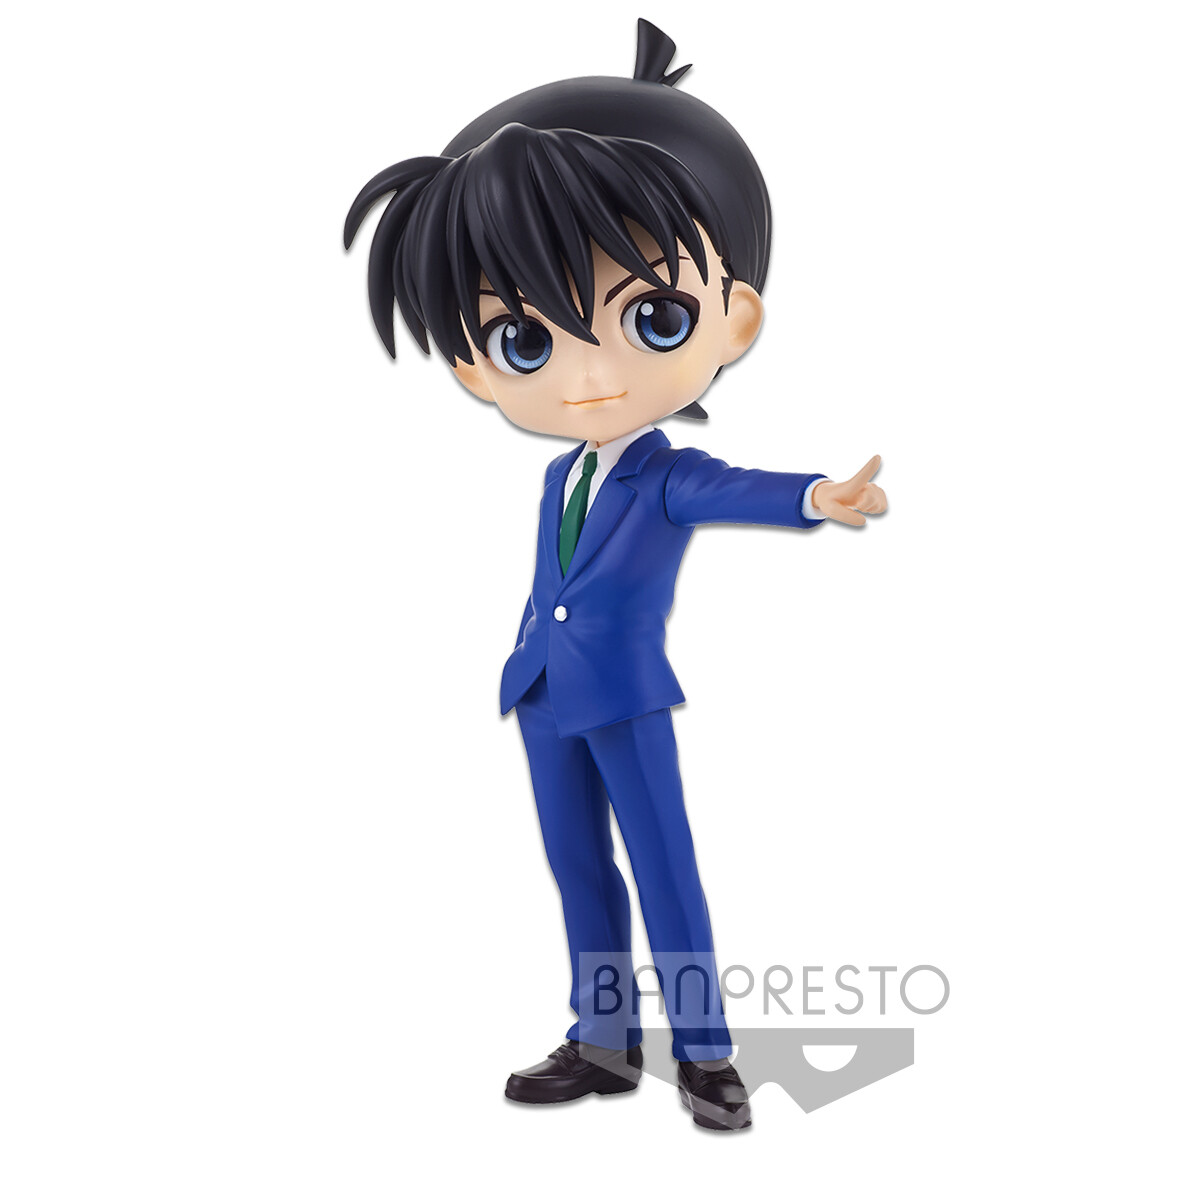 PRE-ORDER Banpresto Detective Conan Q Posket Shinichi Kudo Ver. A